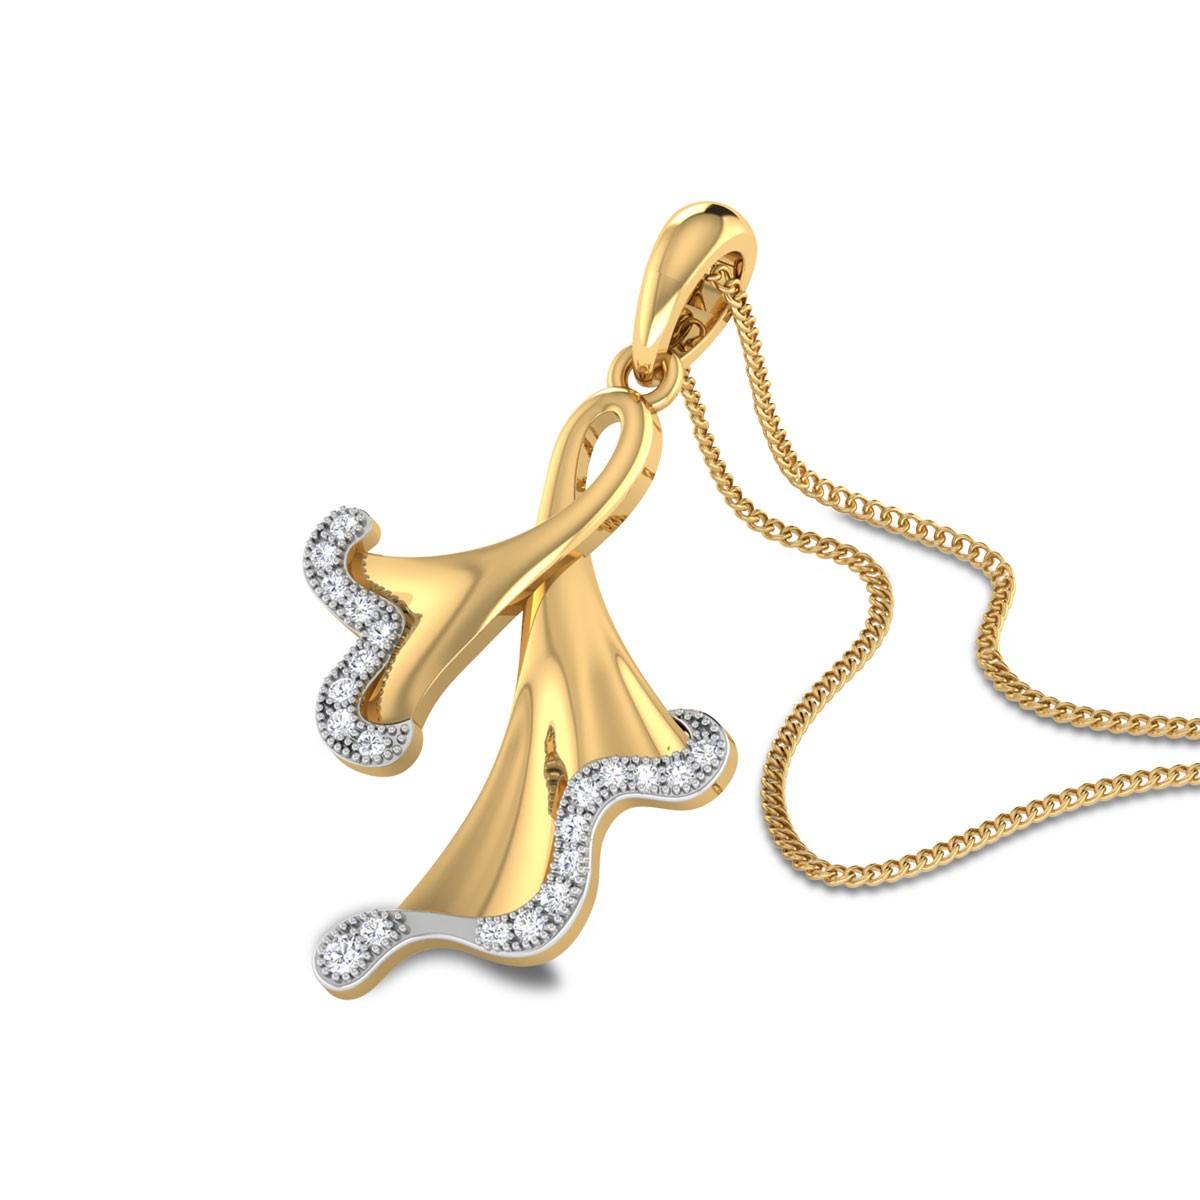 Peryn Floral Diamond Pendant